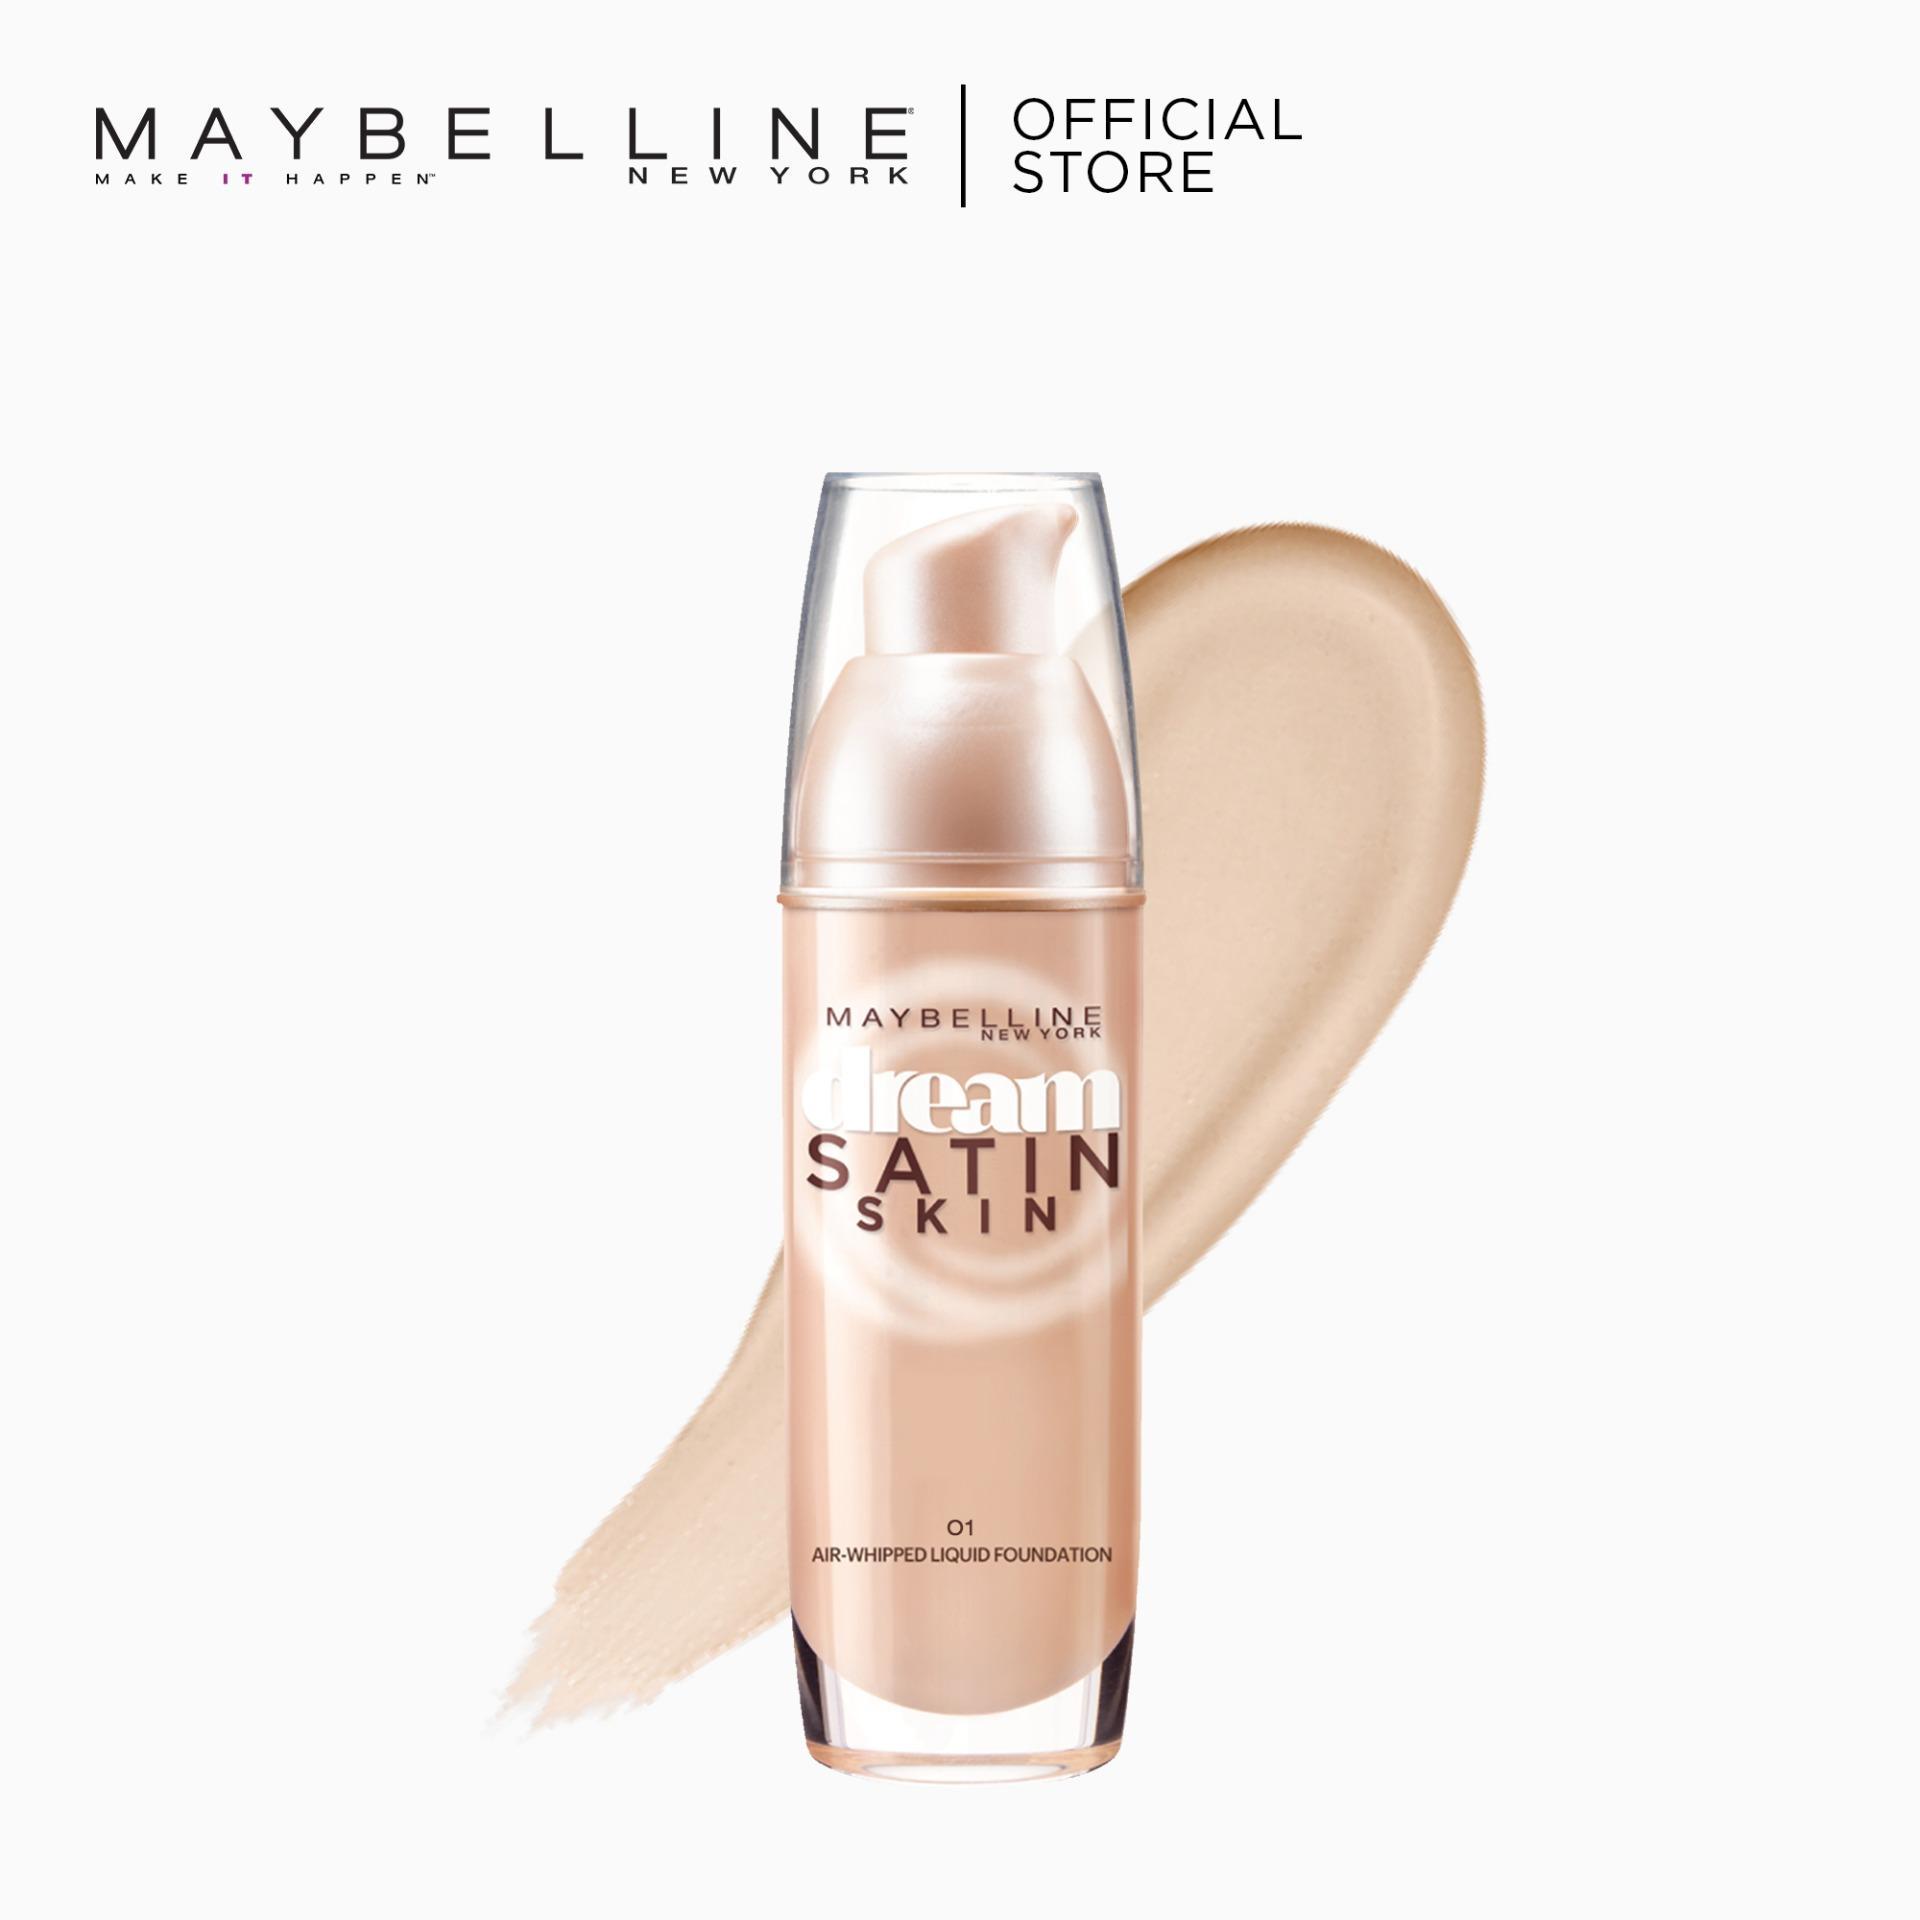 Maybelline Dream Satin Skin Liquid Foundation 30 mL - O1 Philippines